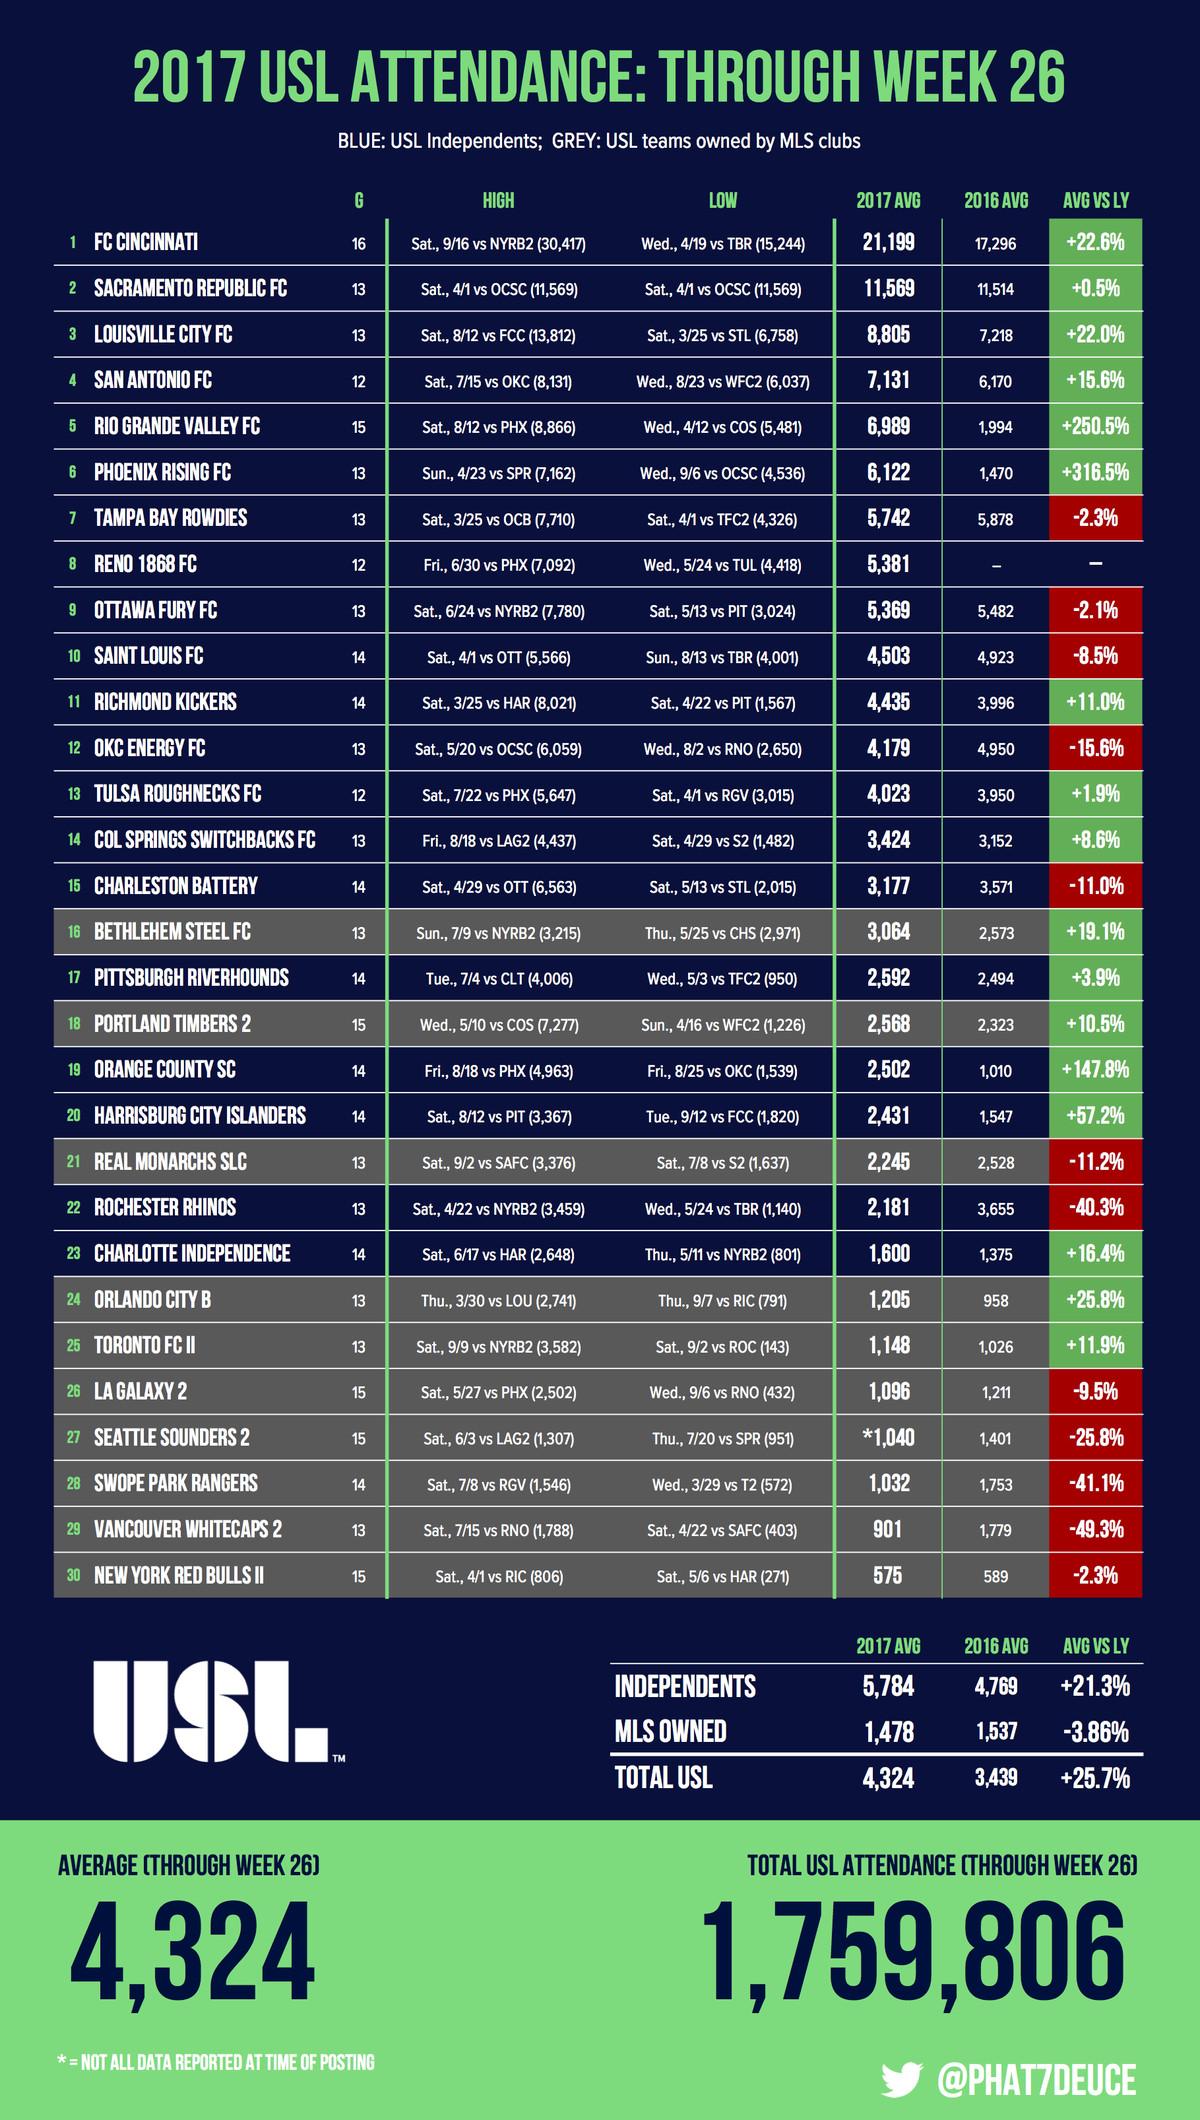 Total USL attendance through week 26